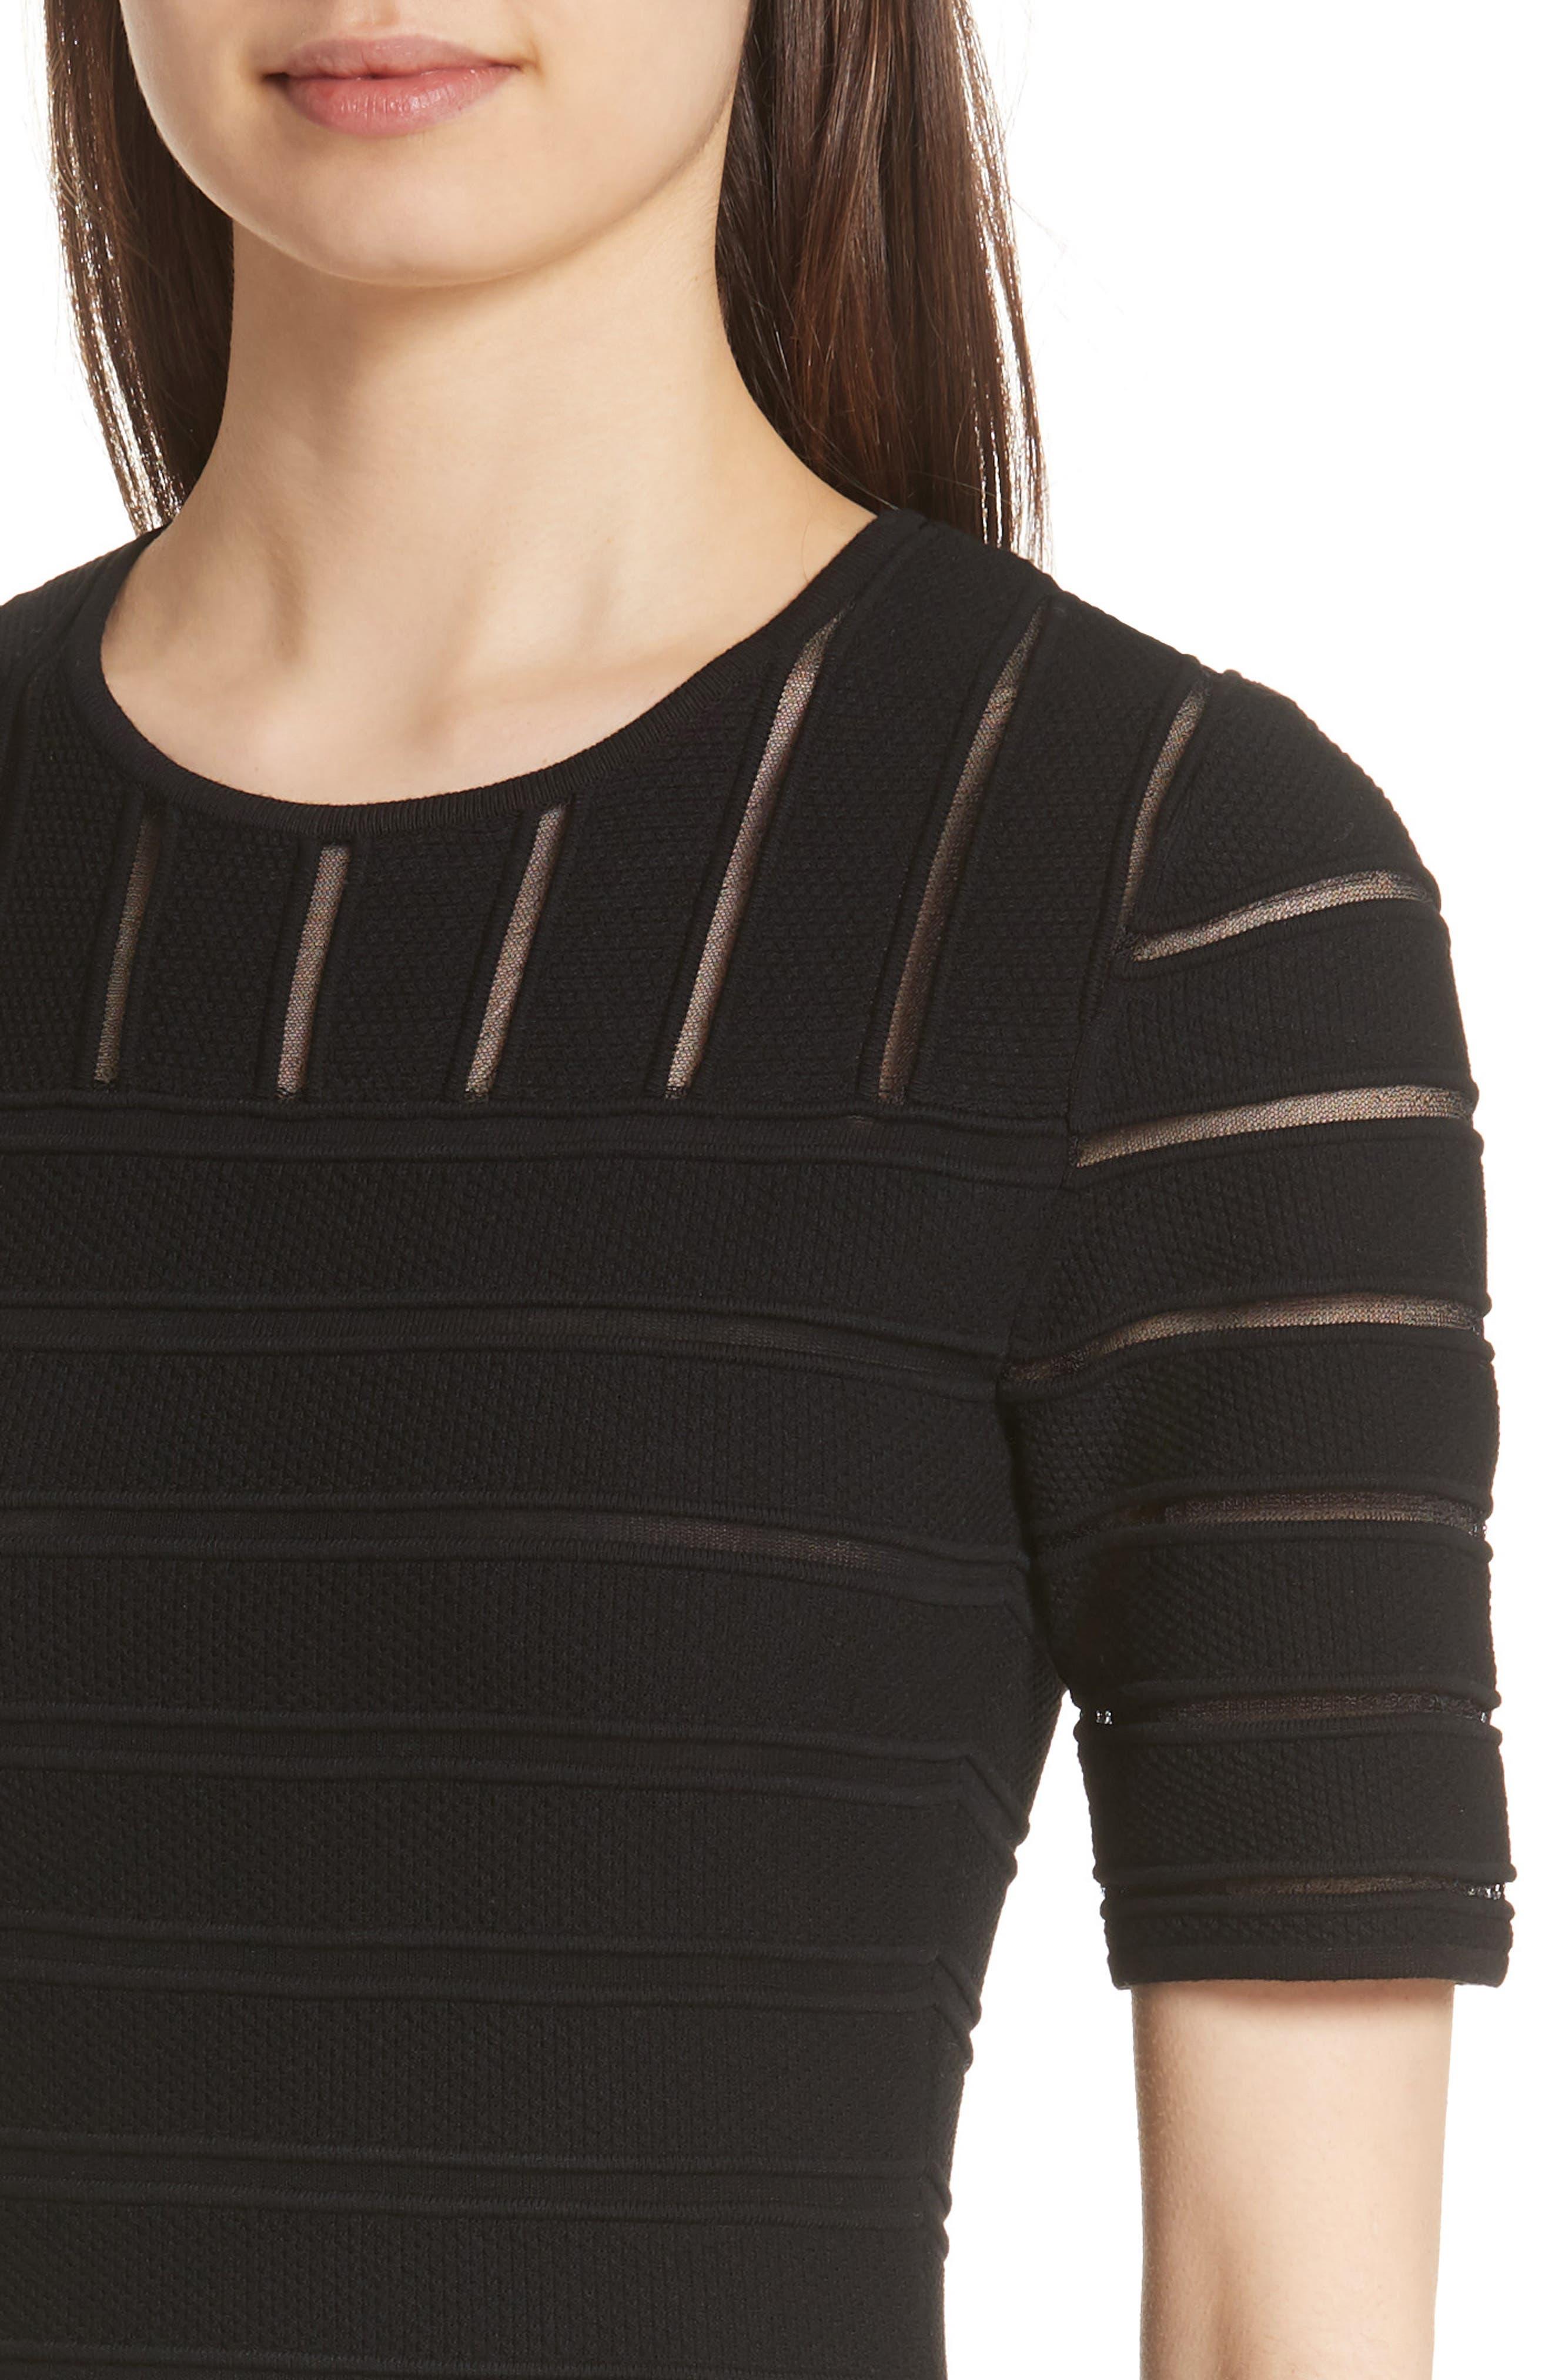 Ottoman Illusion Sweater Dress,                             Alternate thumbnail 4, color,                             CAVIAR